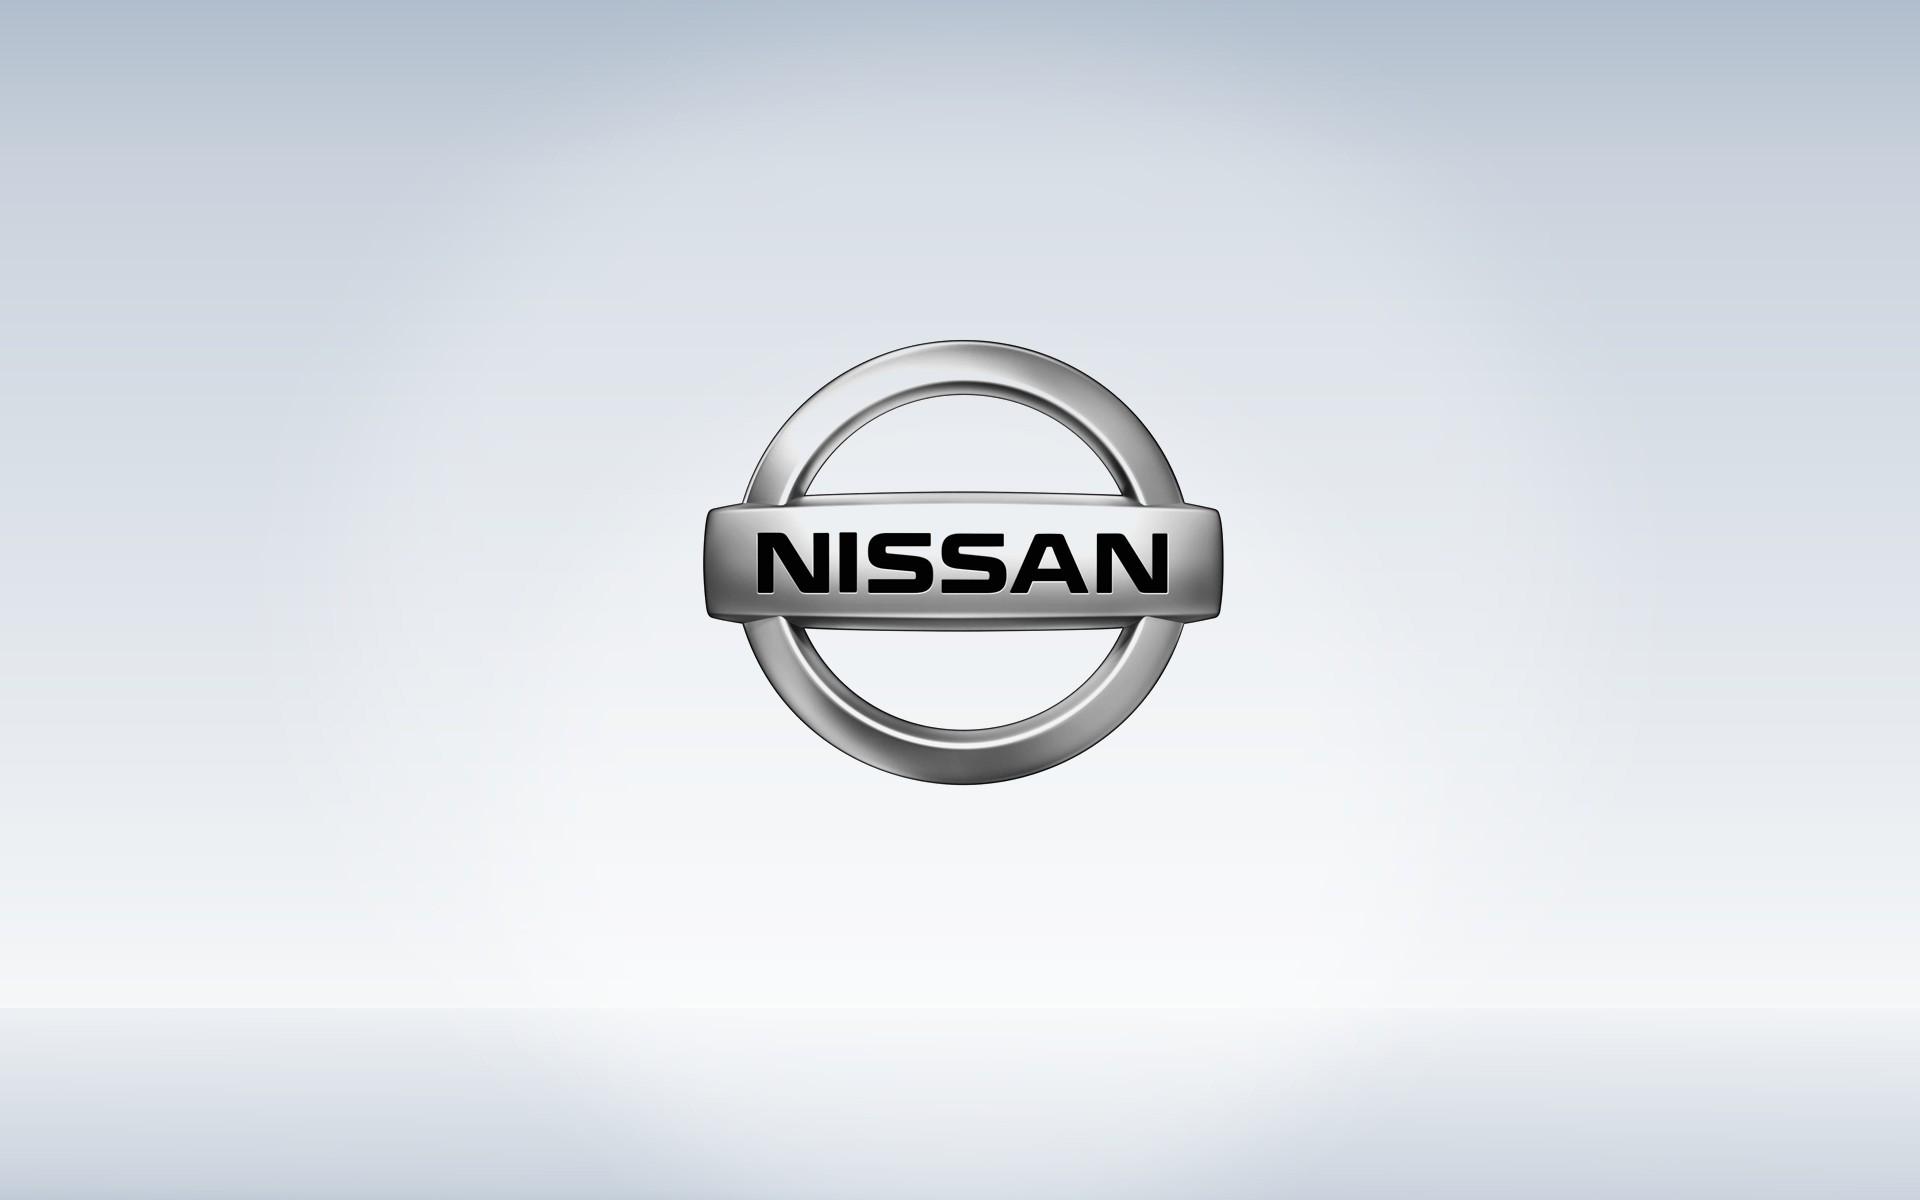 Best Wallpaper Logo Desktop - nissan-logo-desktop-wallpaper-59071-60852-hd-wallpapers  2018_94837.jpg